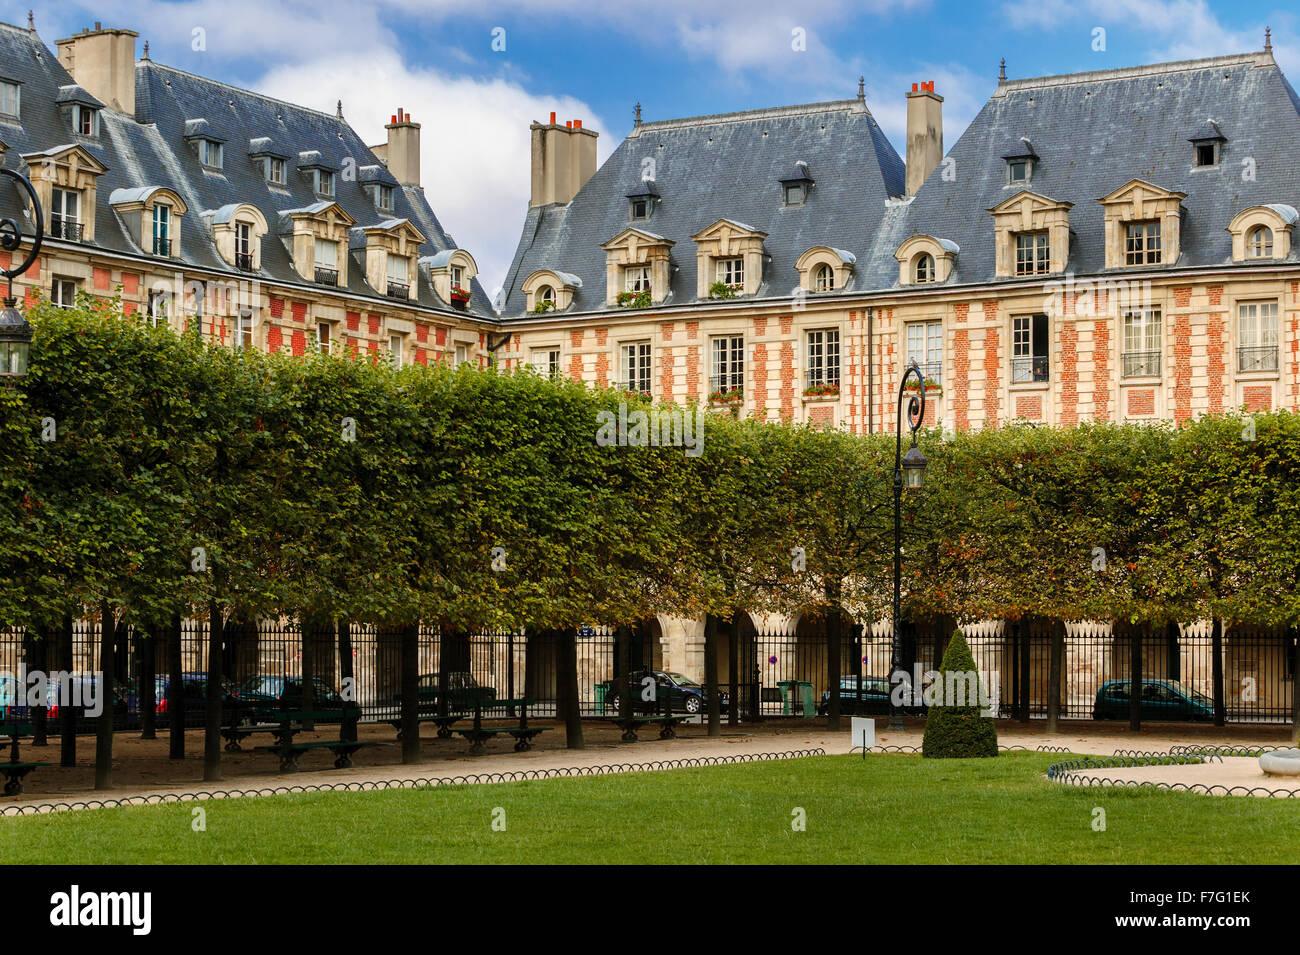 Garden and housefronts (with blue slates dormer roofs) on Place des Vosges in Le Marais, 4th arrondissment, Paris, - Stock Image